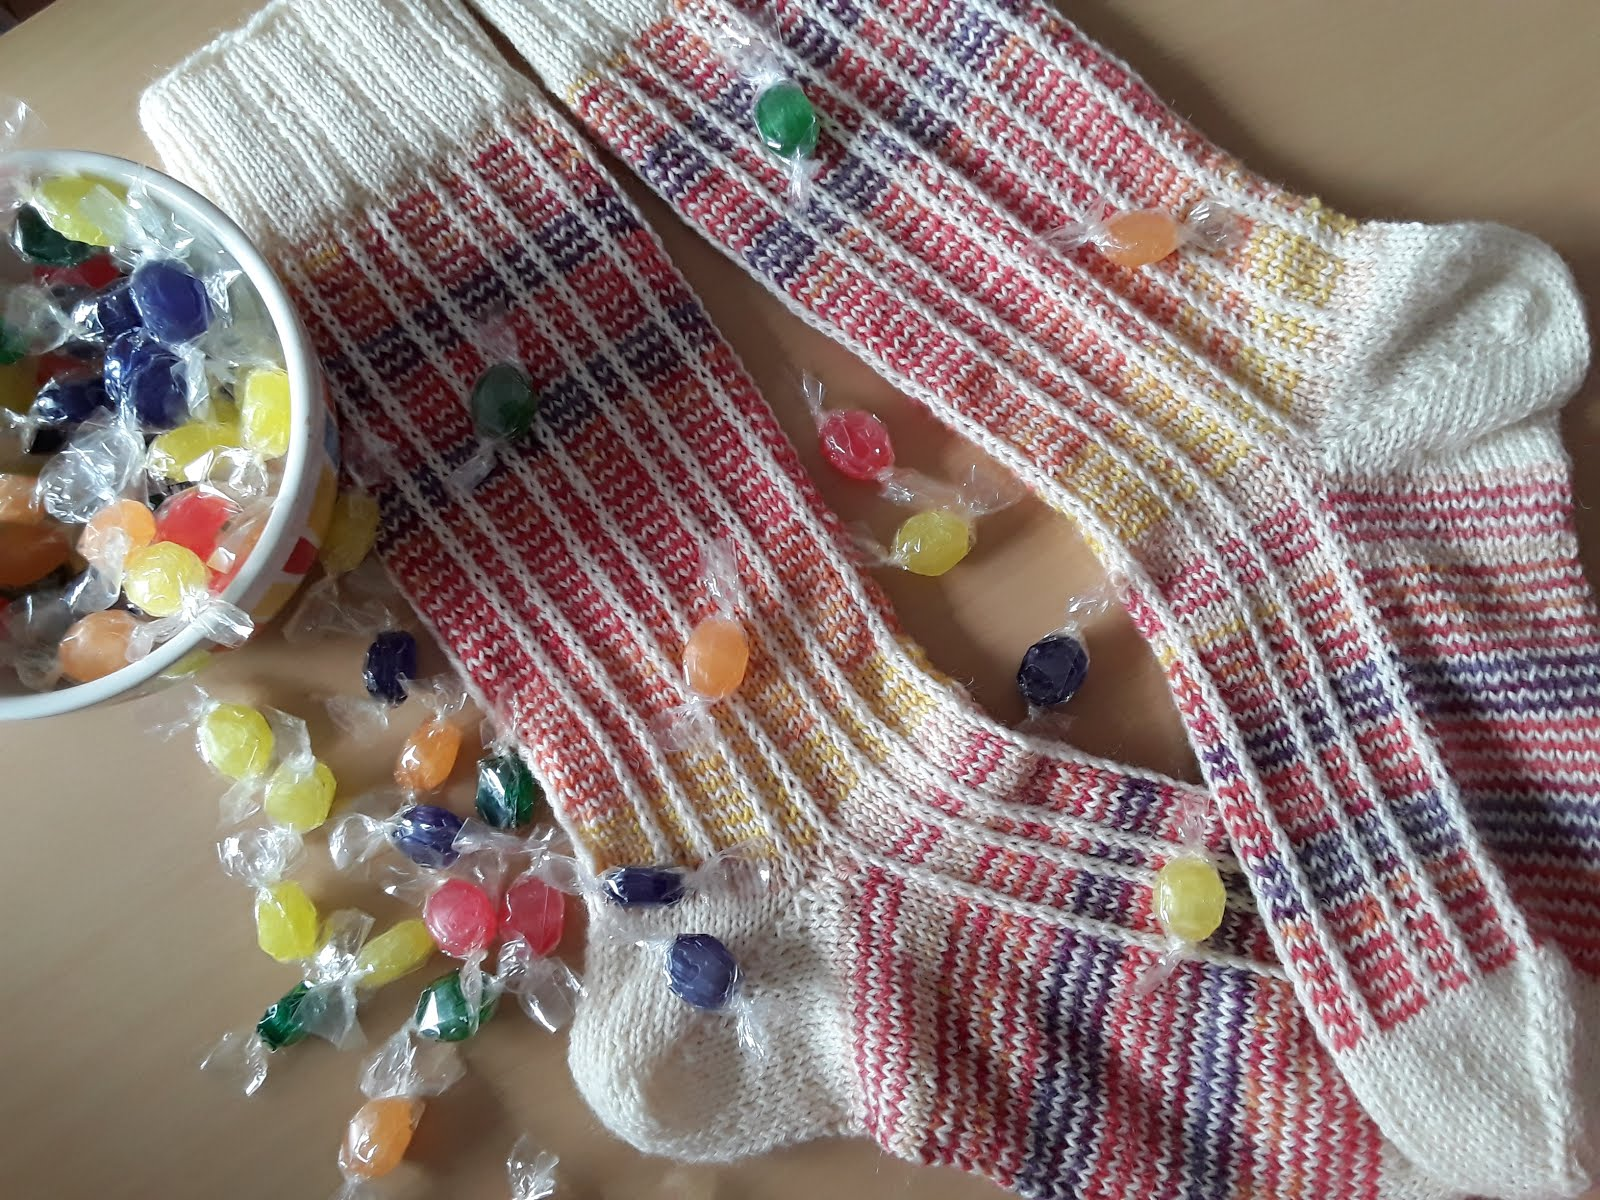 Modelo "Candylicious Socks"